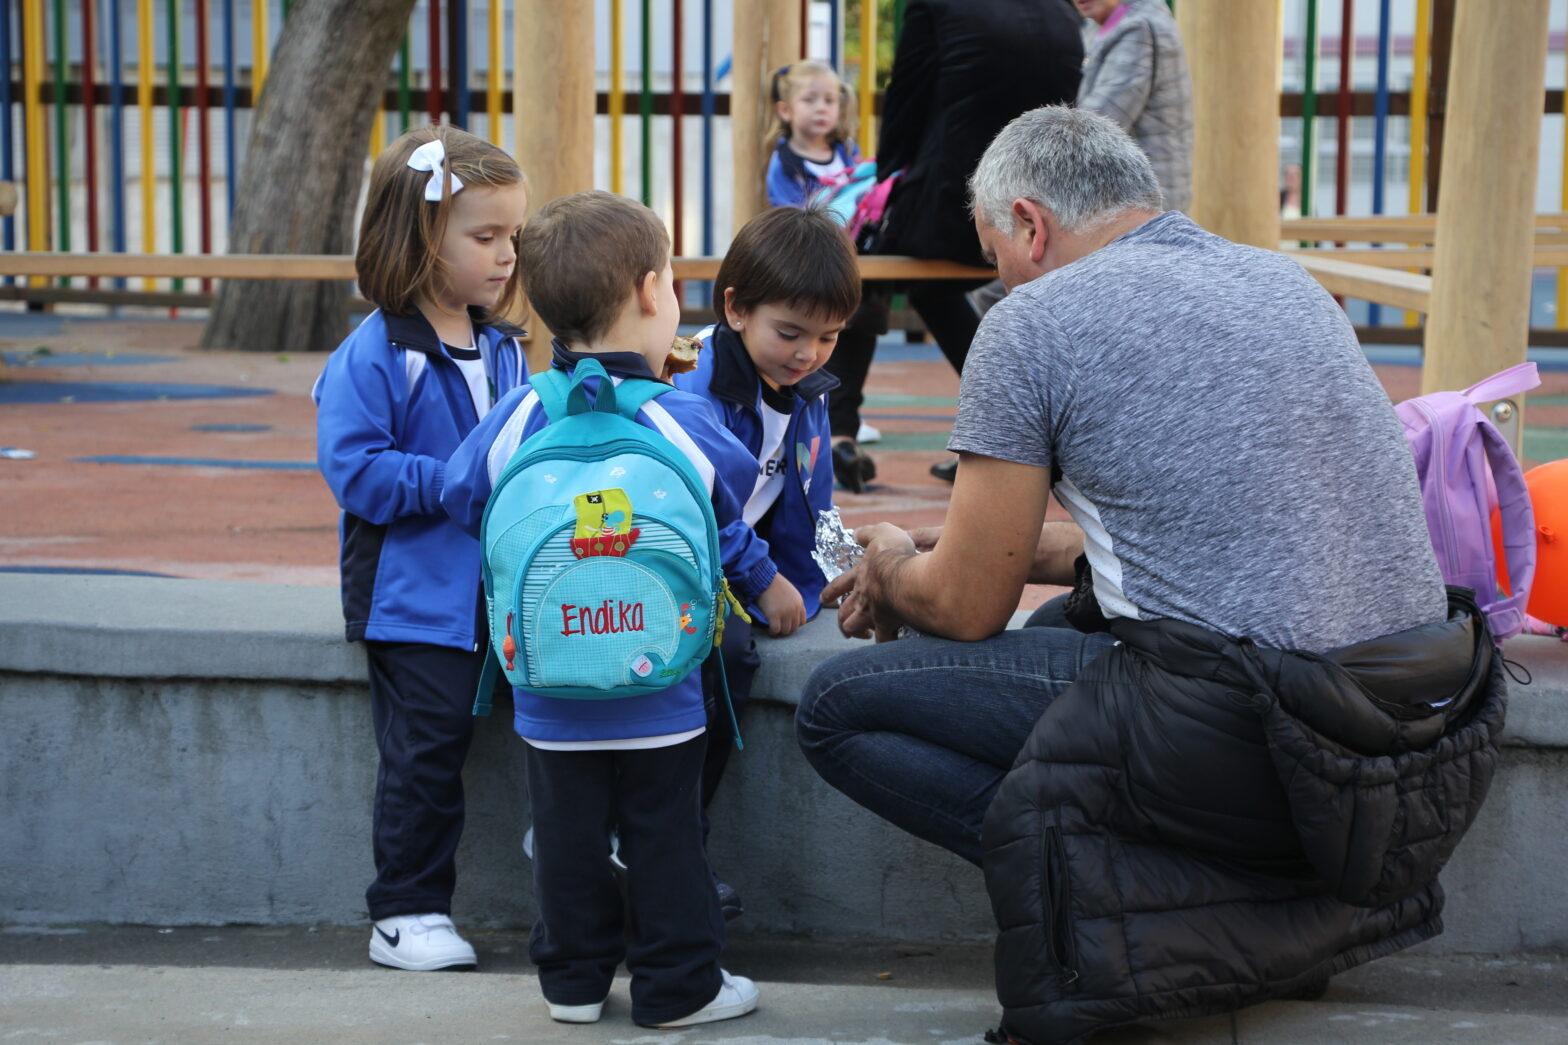 Nevers ikastetxea cooperativa escolar de padres y madres